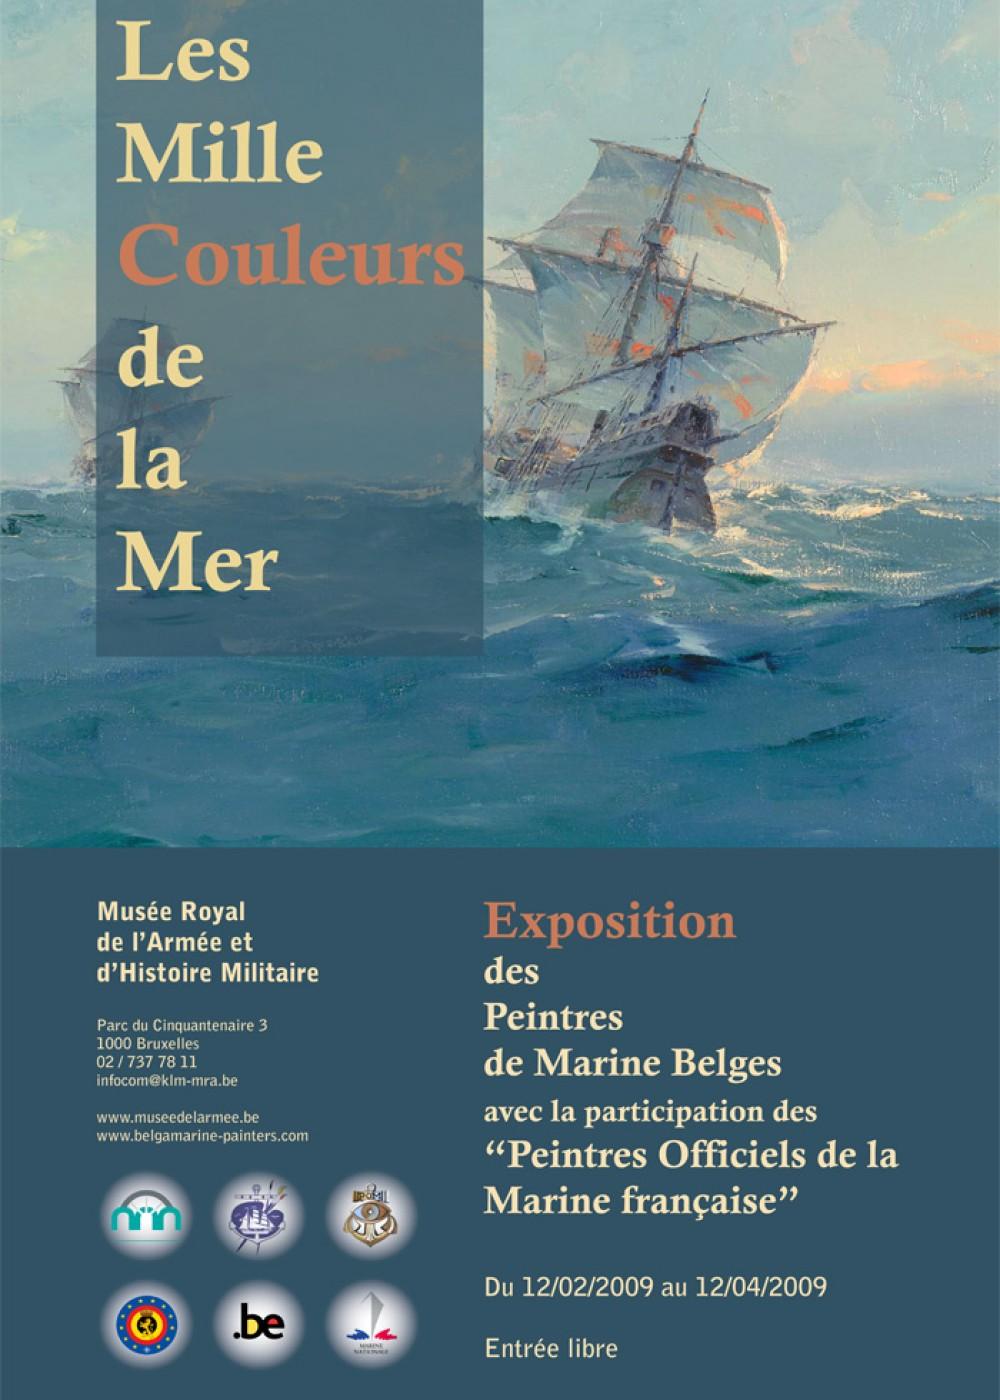 Les Peintres de Marine Belge